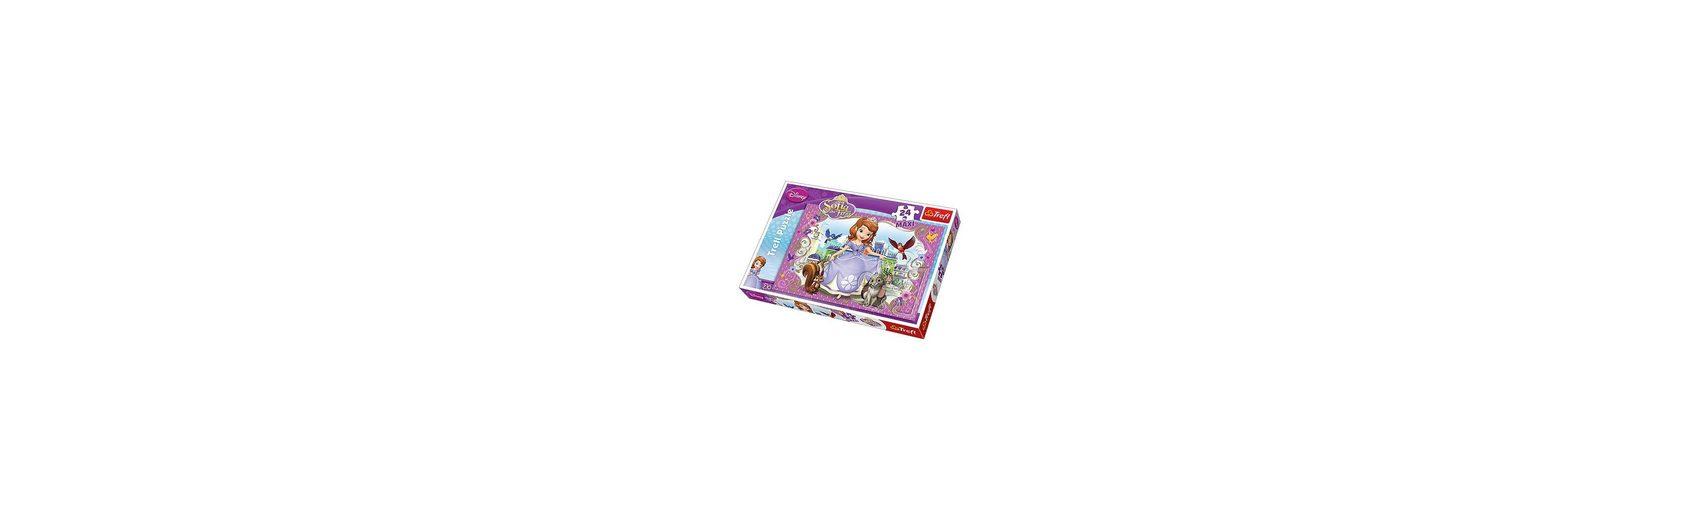 Trefl Maxipuzzle 24 Teile - Sofia die Erste